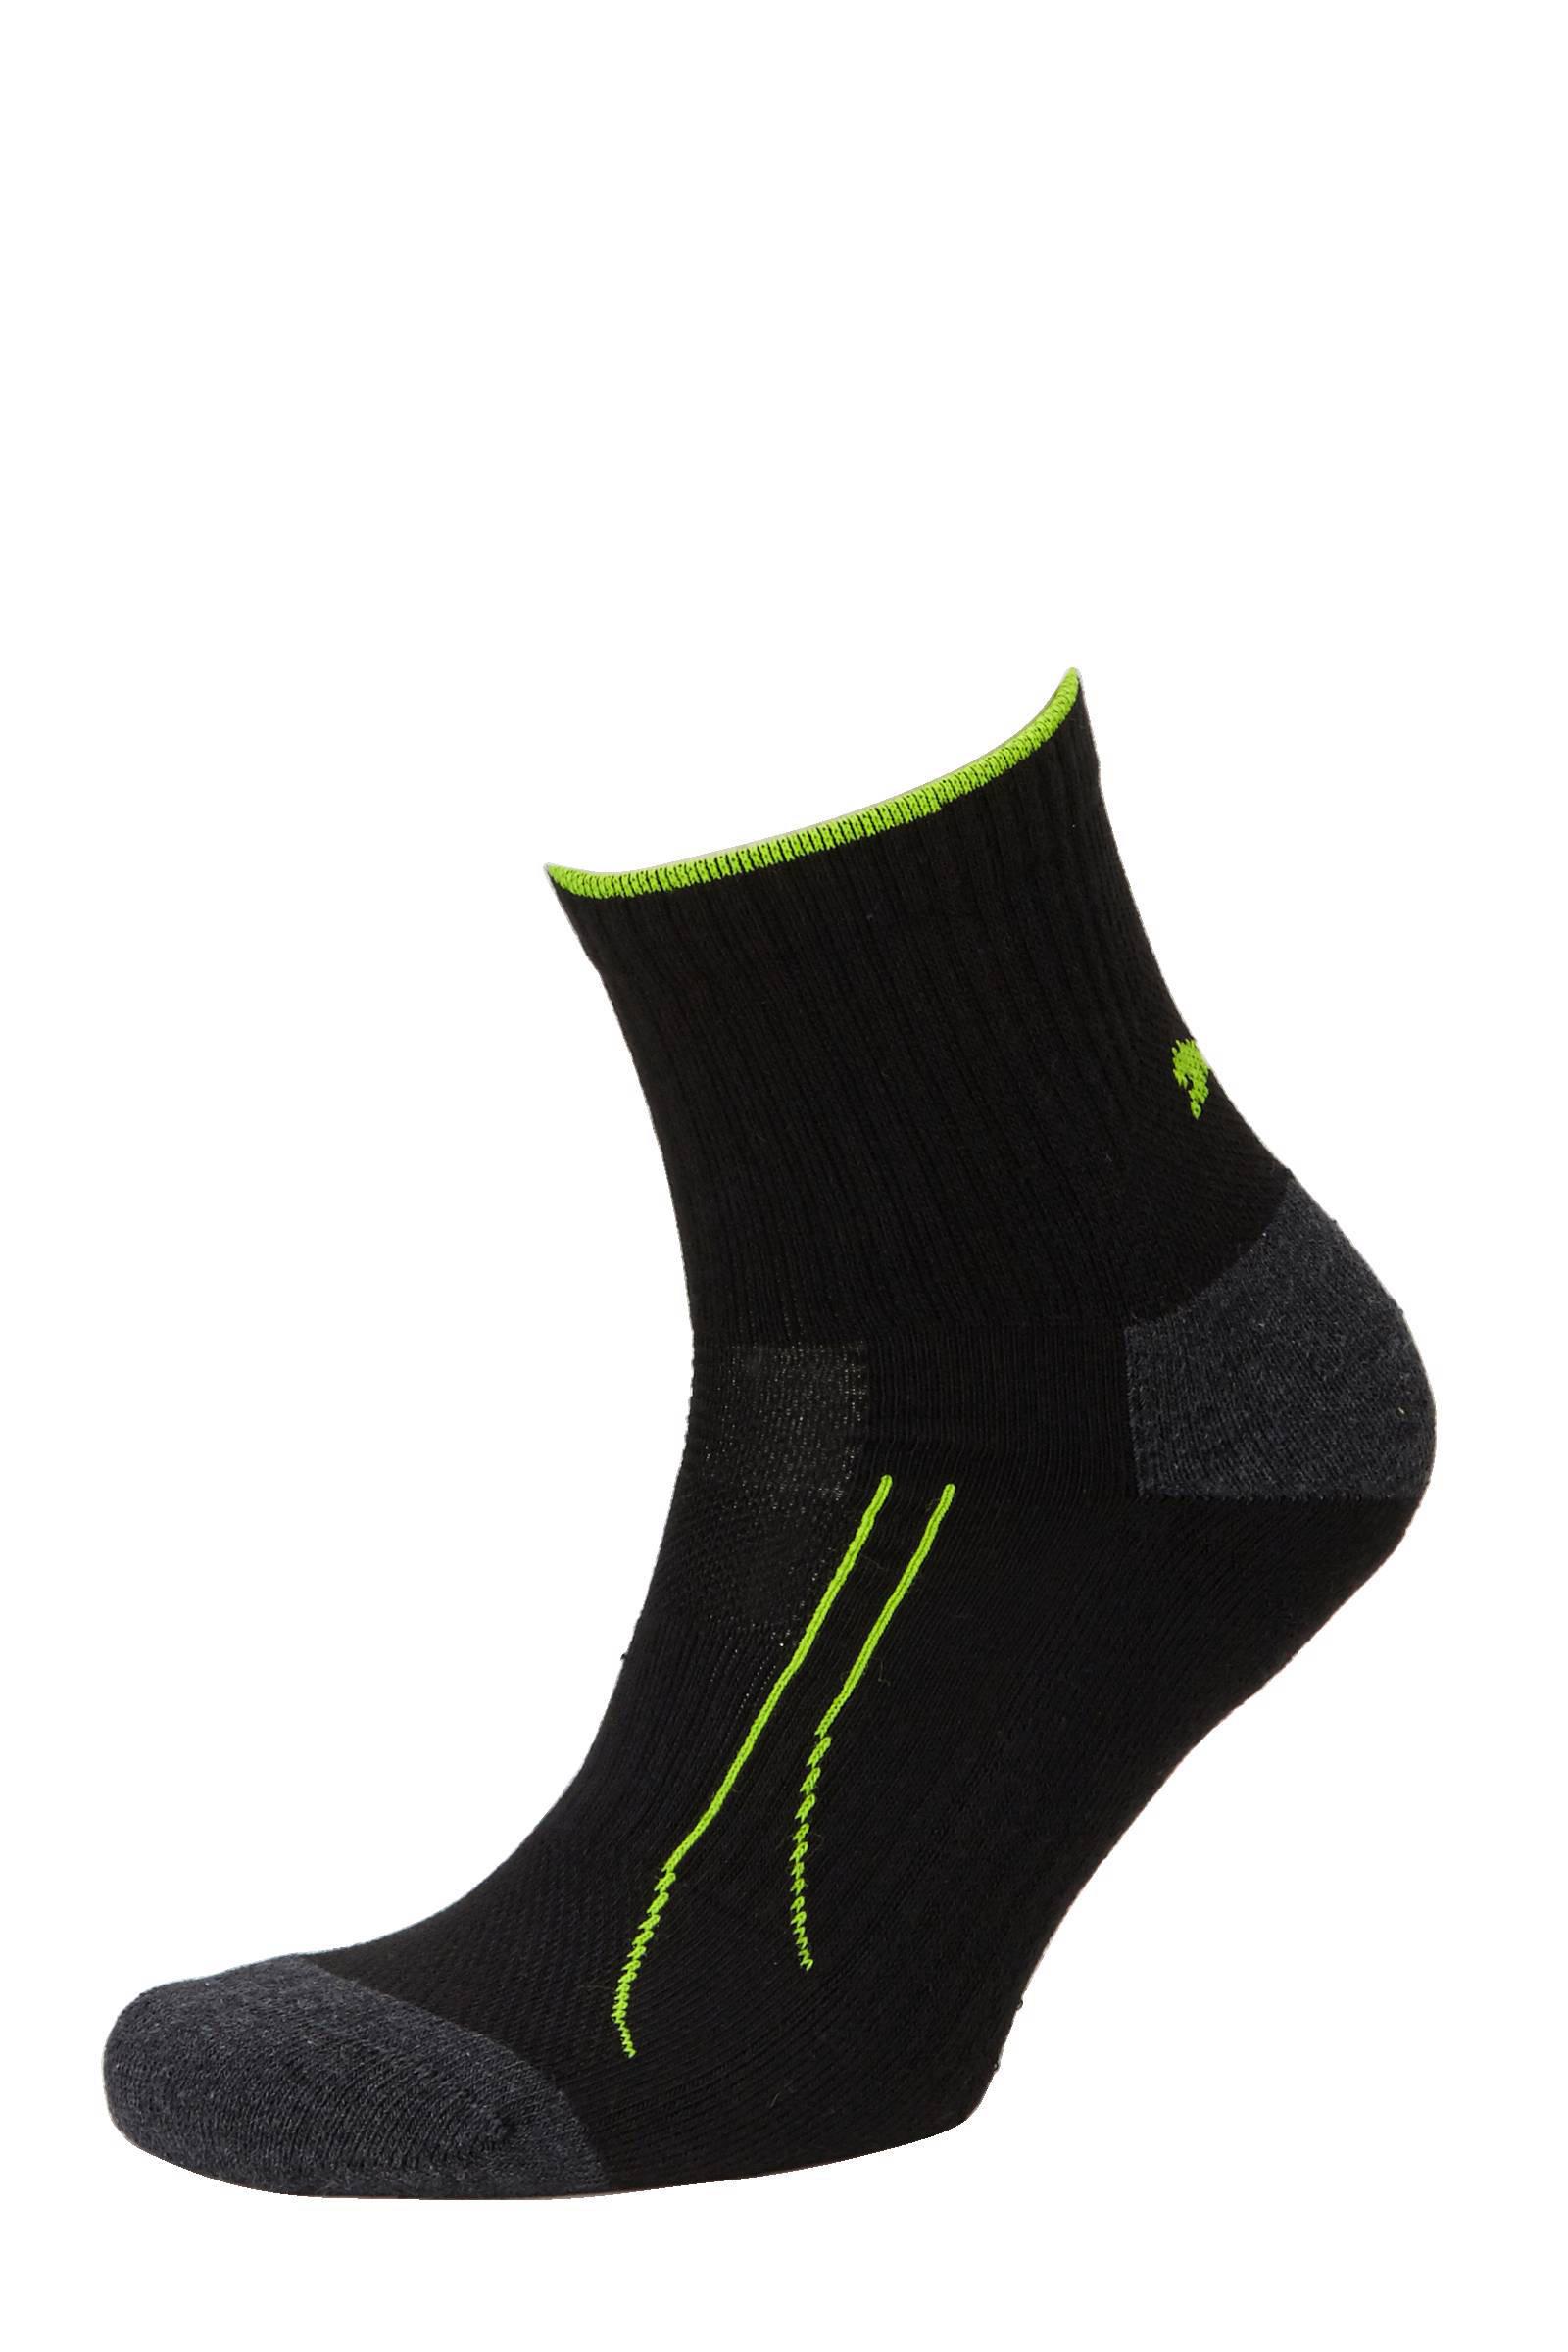 Puma Performance Train Short Sock black 2-pack-35-38